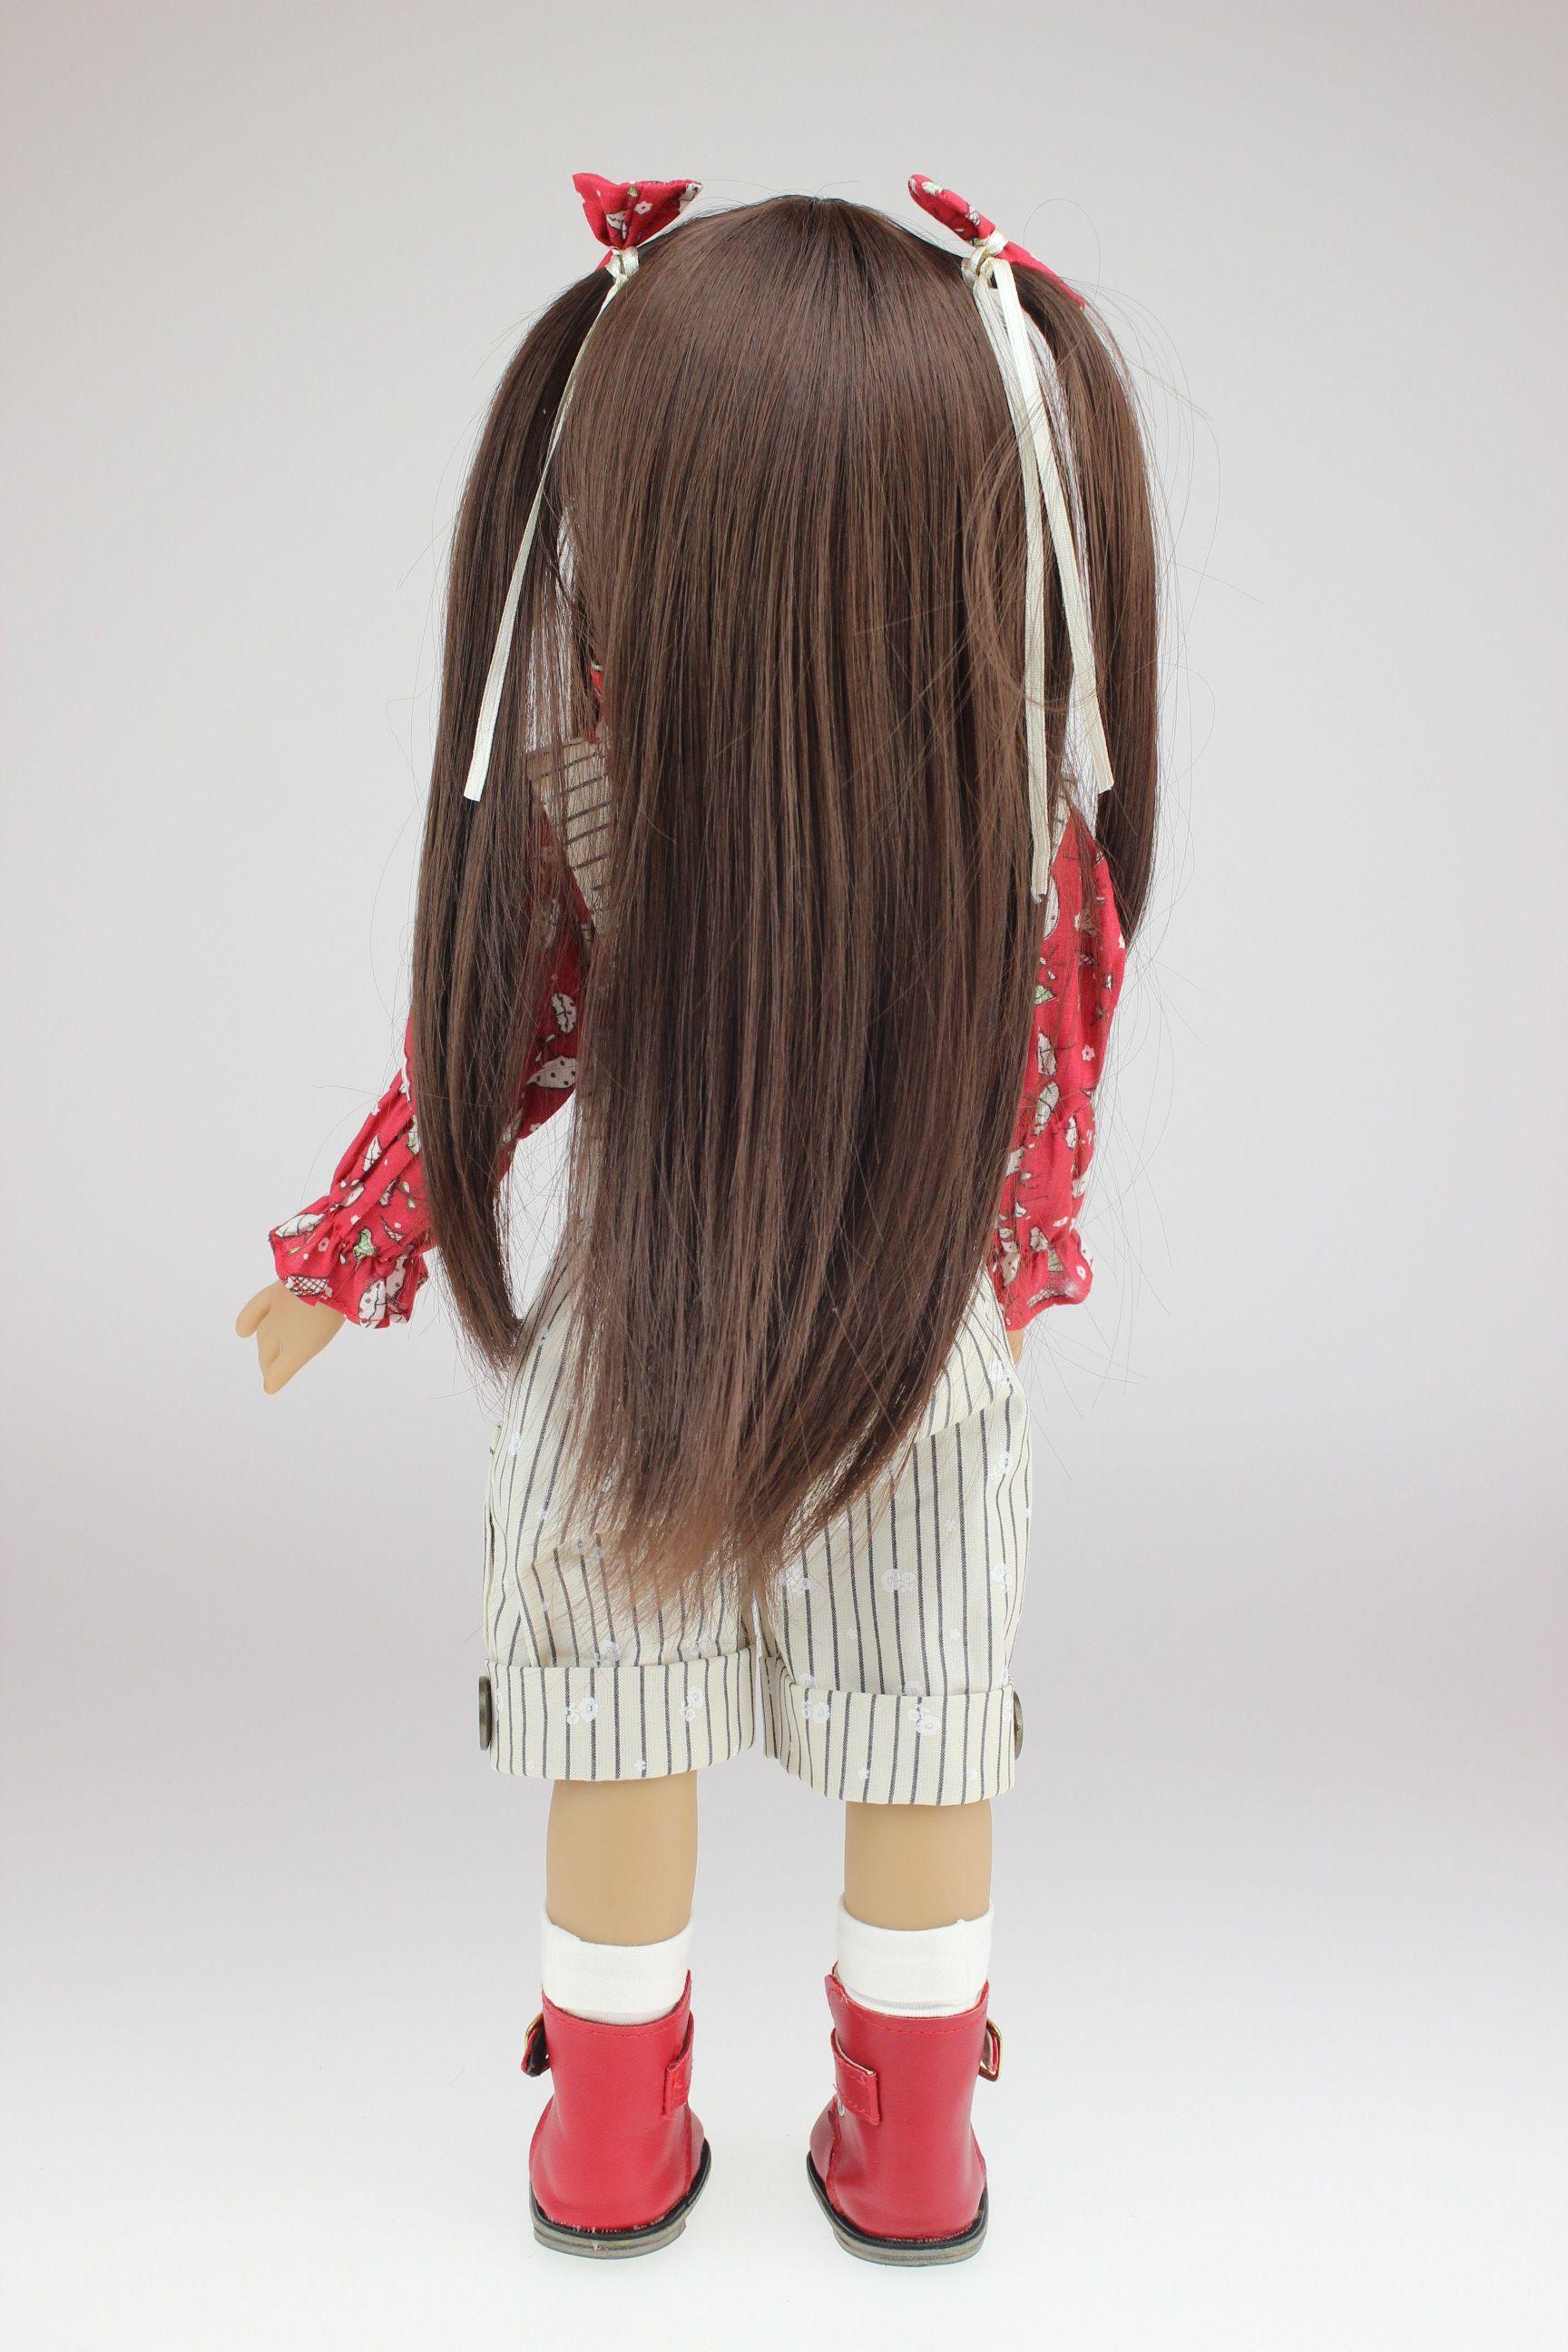 HOT sale 18 INCH Doll Realistic American Girl Full Vinyl Reborn Dolls As Christmas Birthday Gifts